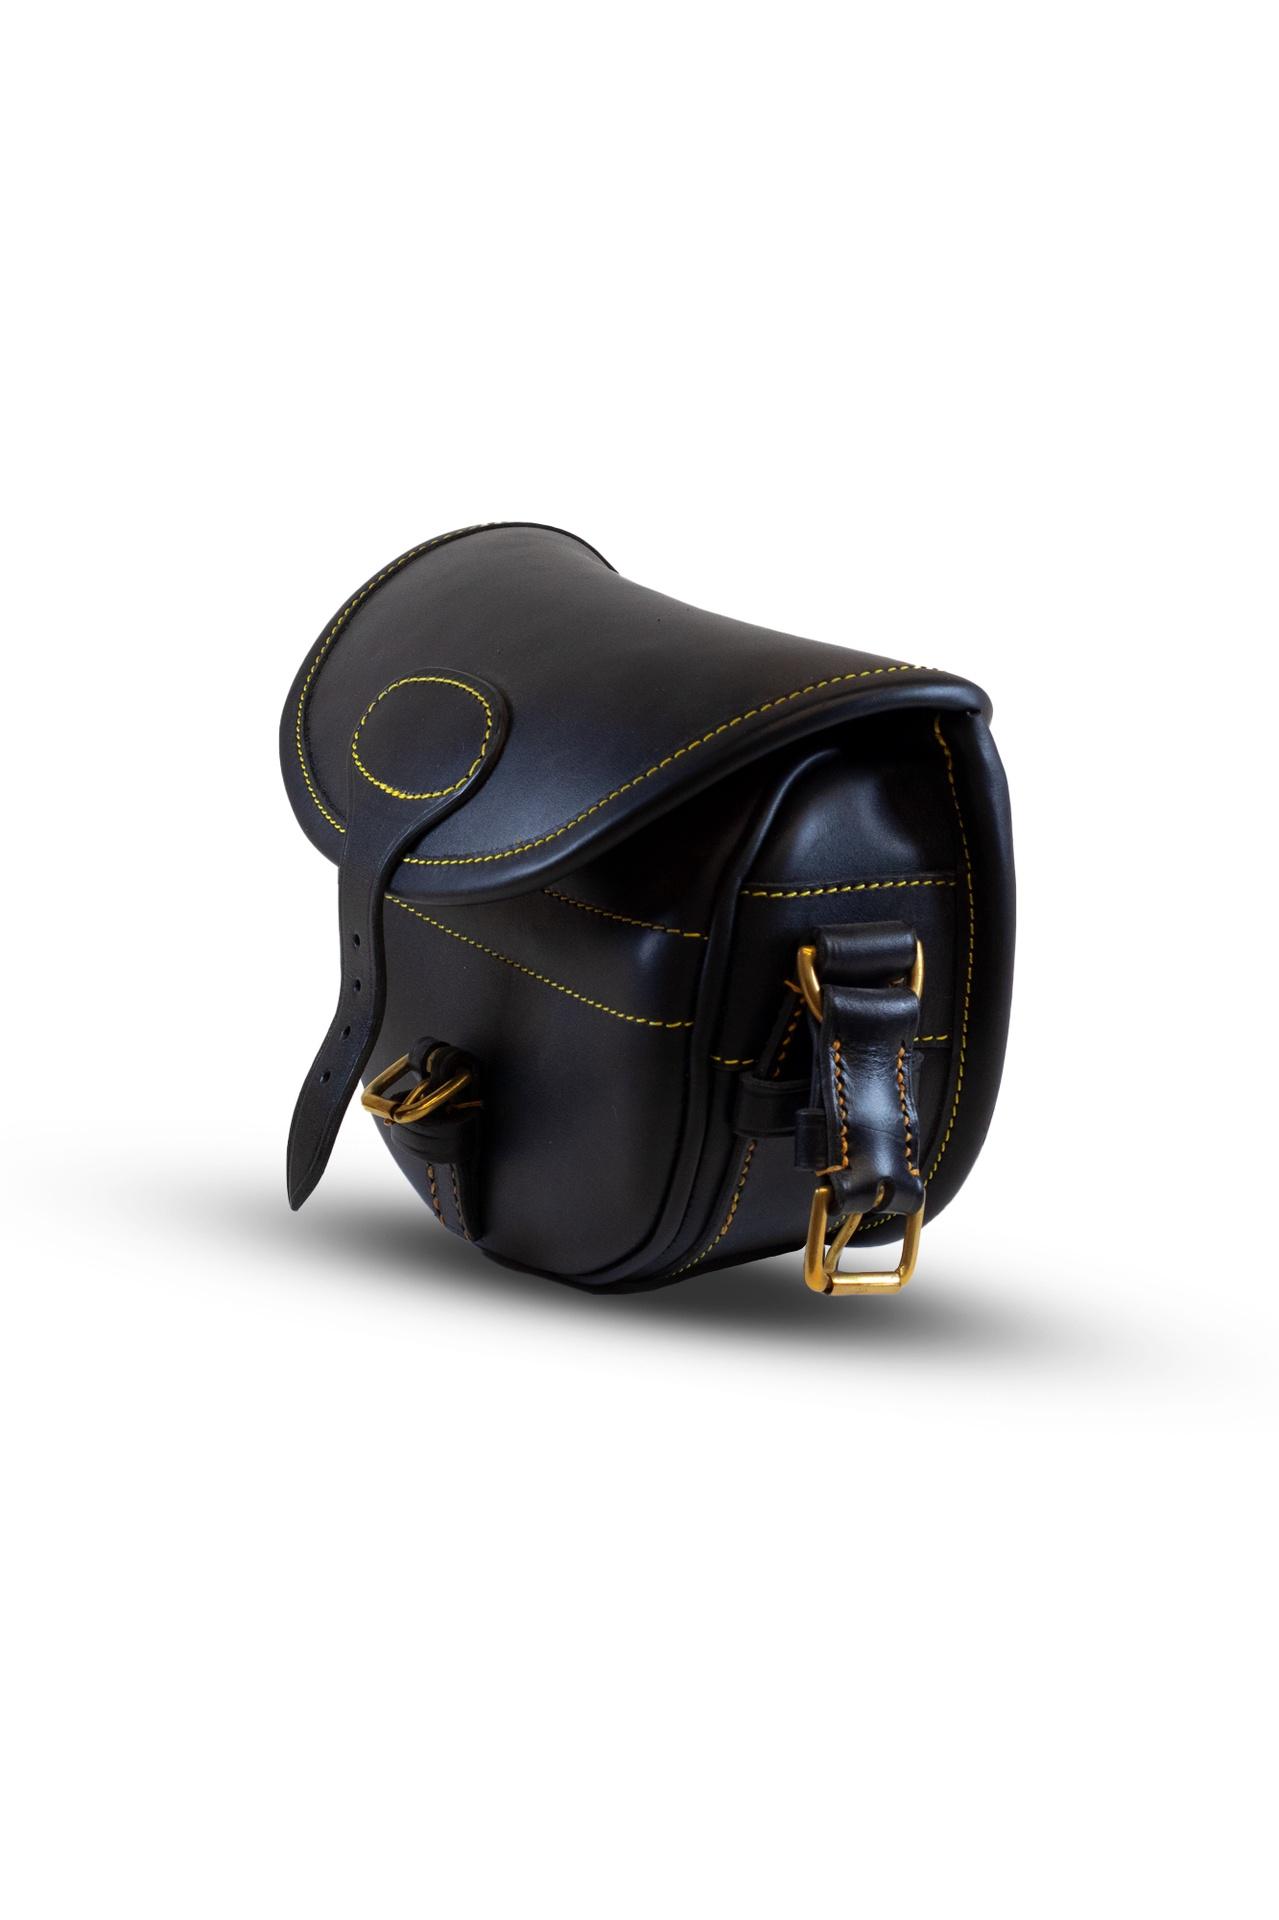 Best Leather Cartridge Bag (75) – Black